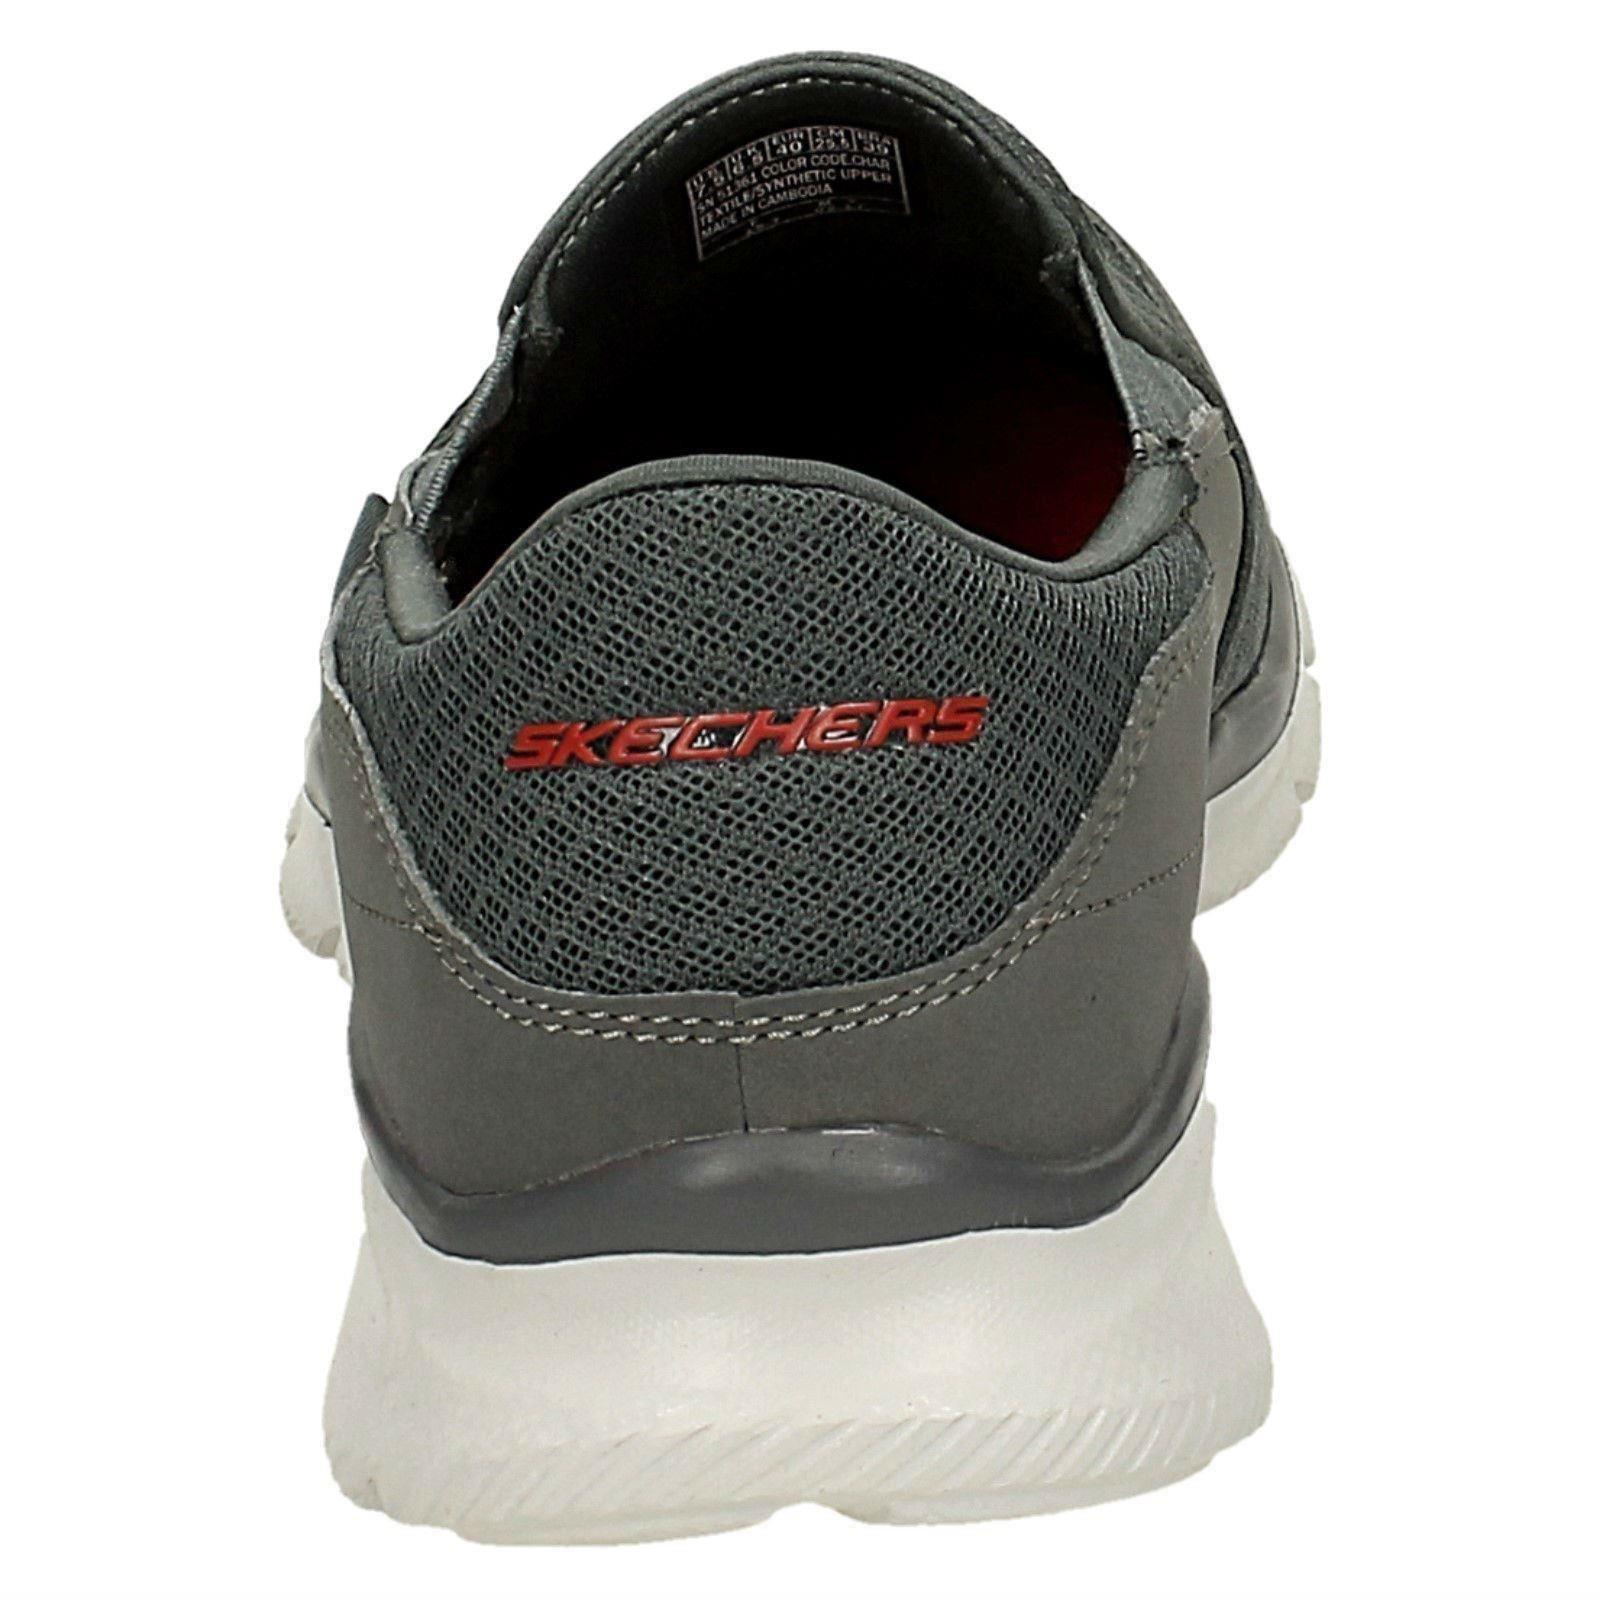 Mens Skechers Memory Persistent Foam Slip On Trainers Persistent Memory / 51361 1ac216